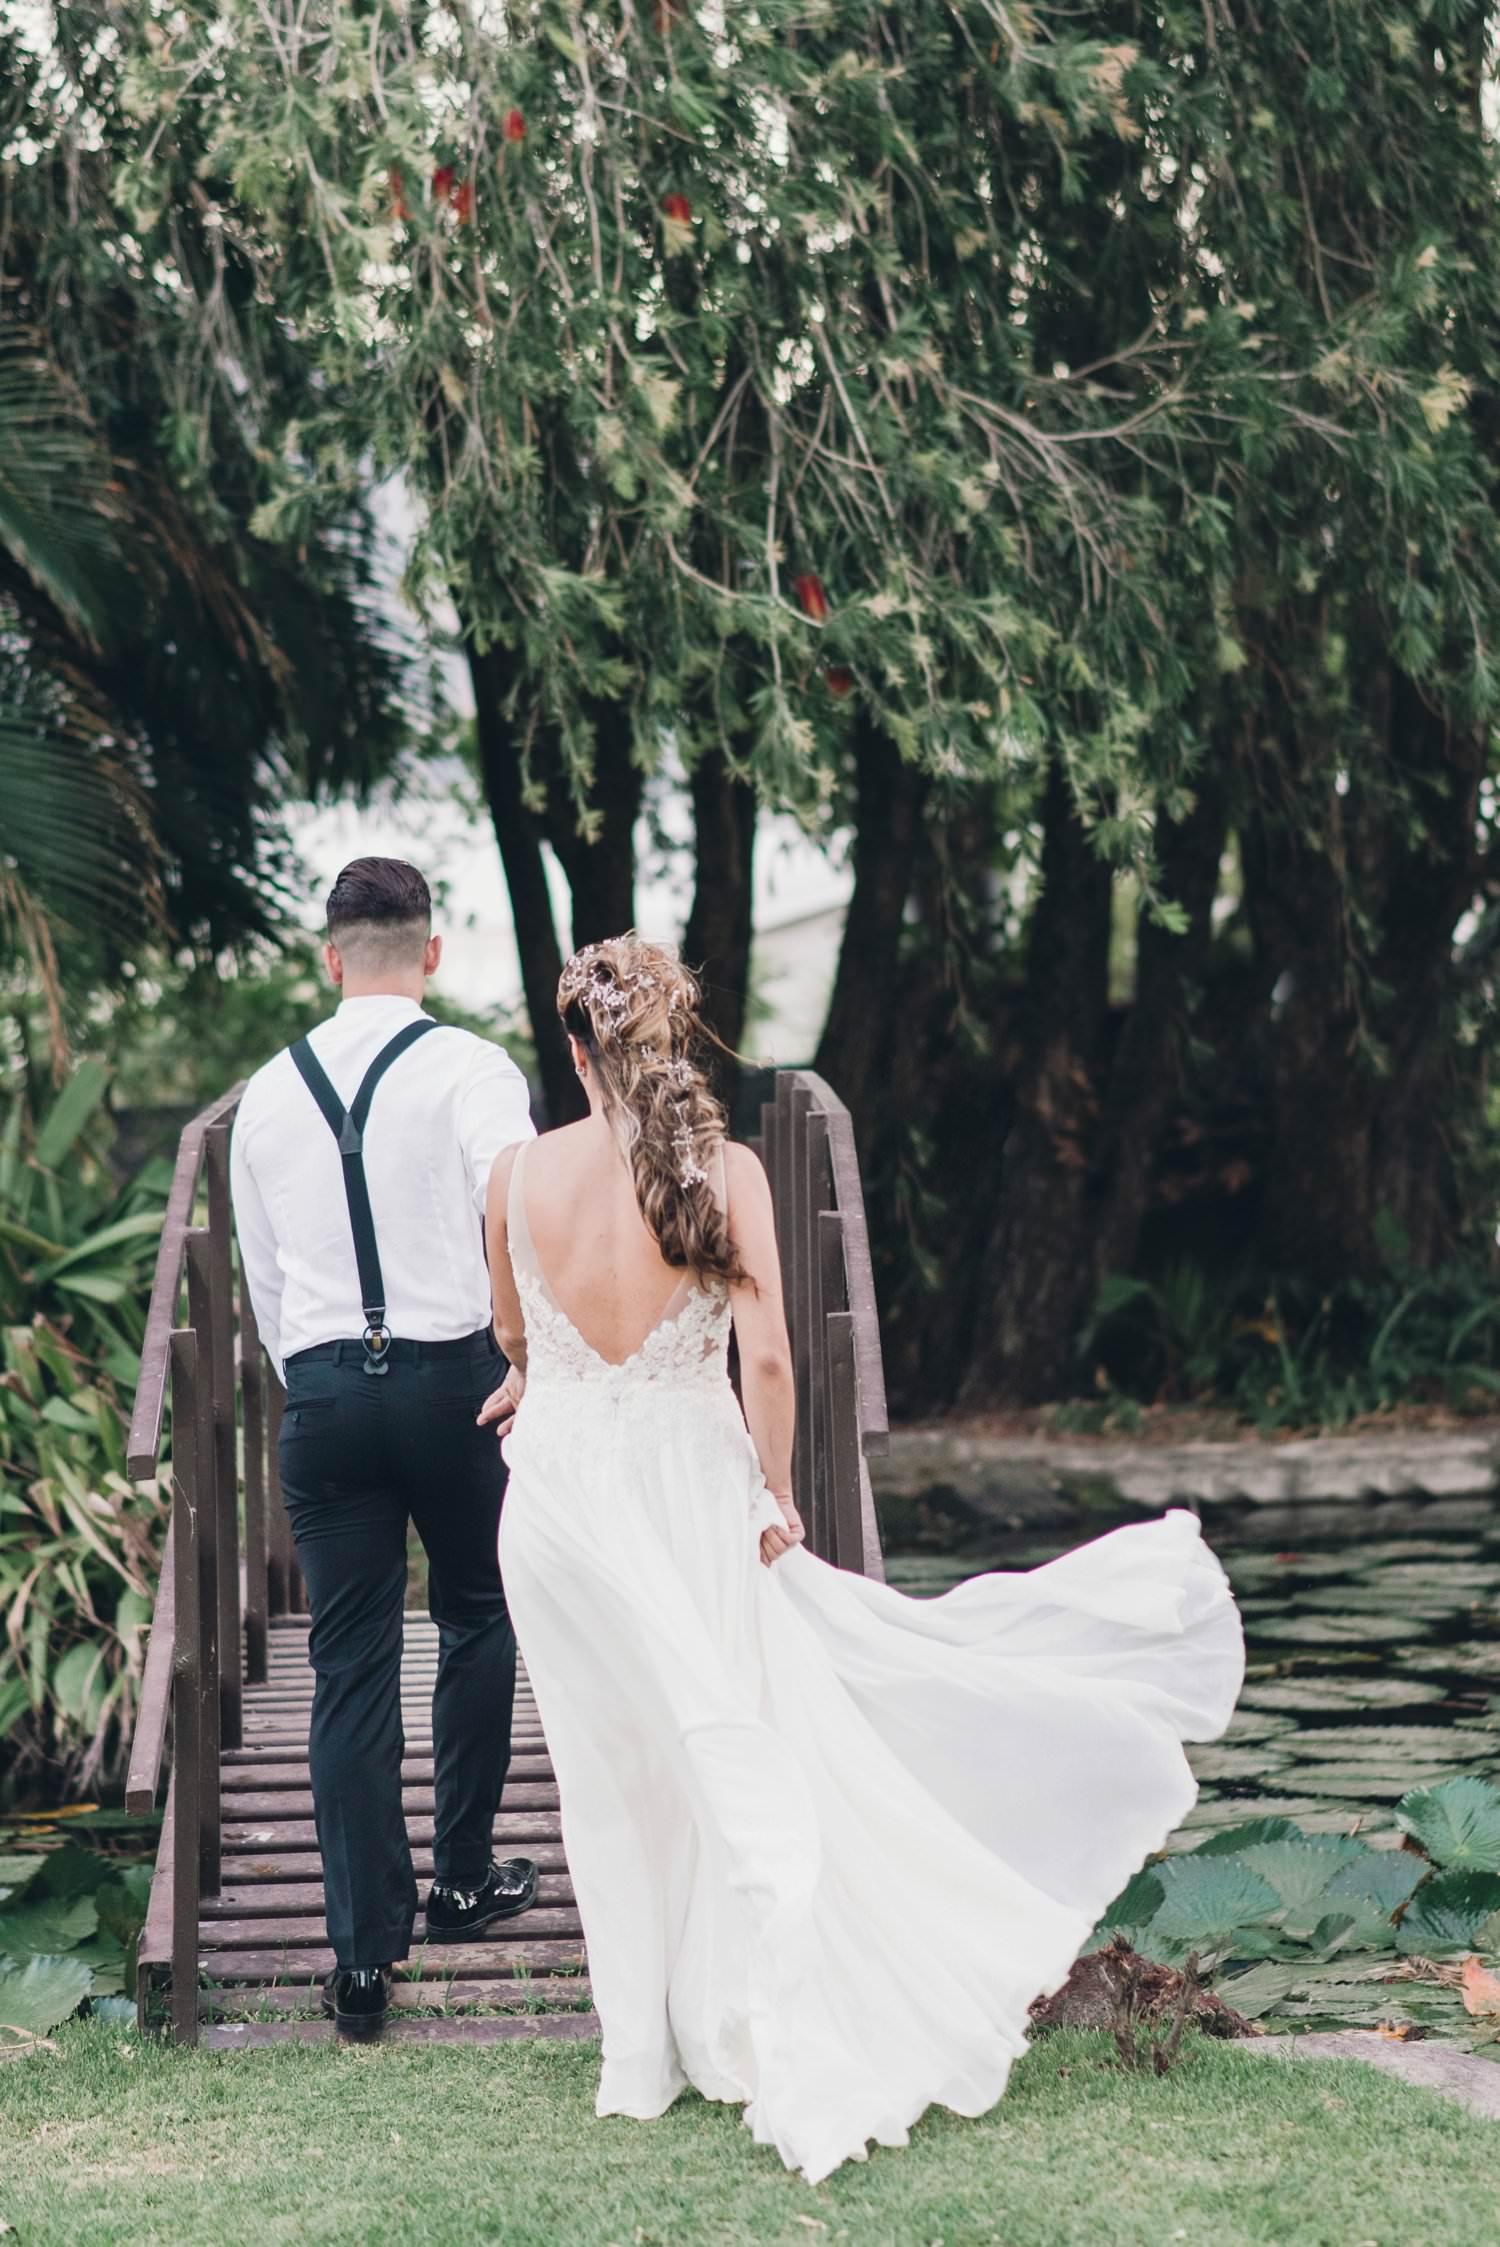 Cristina_JuanCarlos_Costa_Rica_destination_wedding_Campo_Lago_0060.jpg